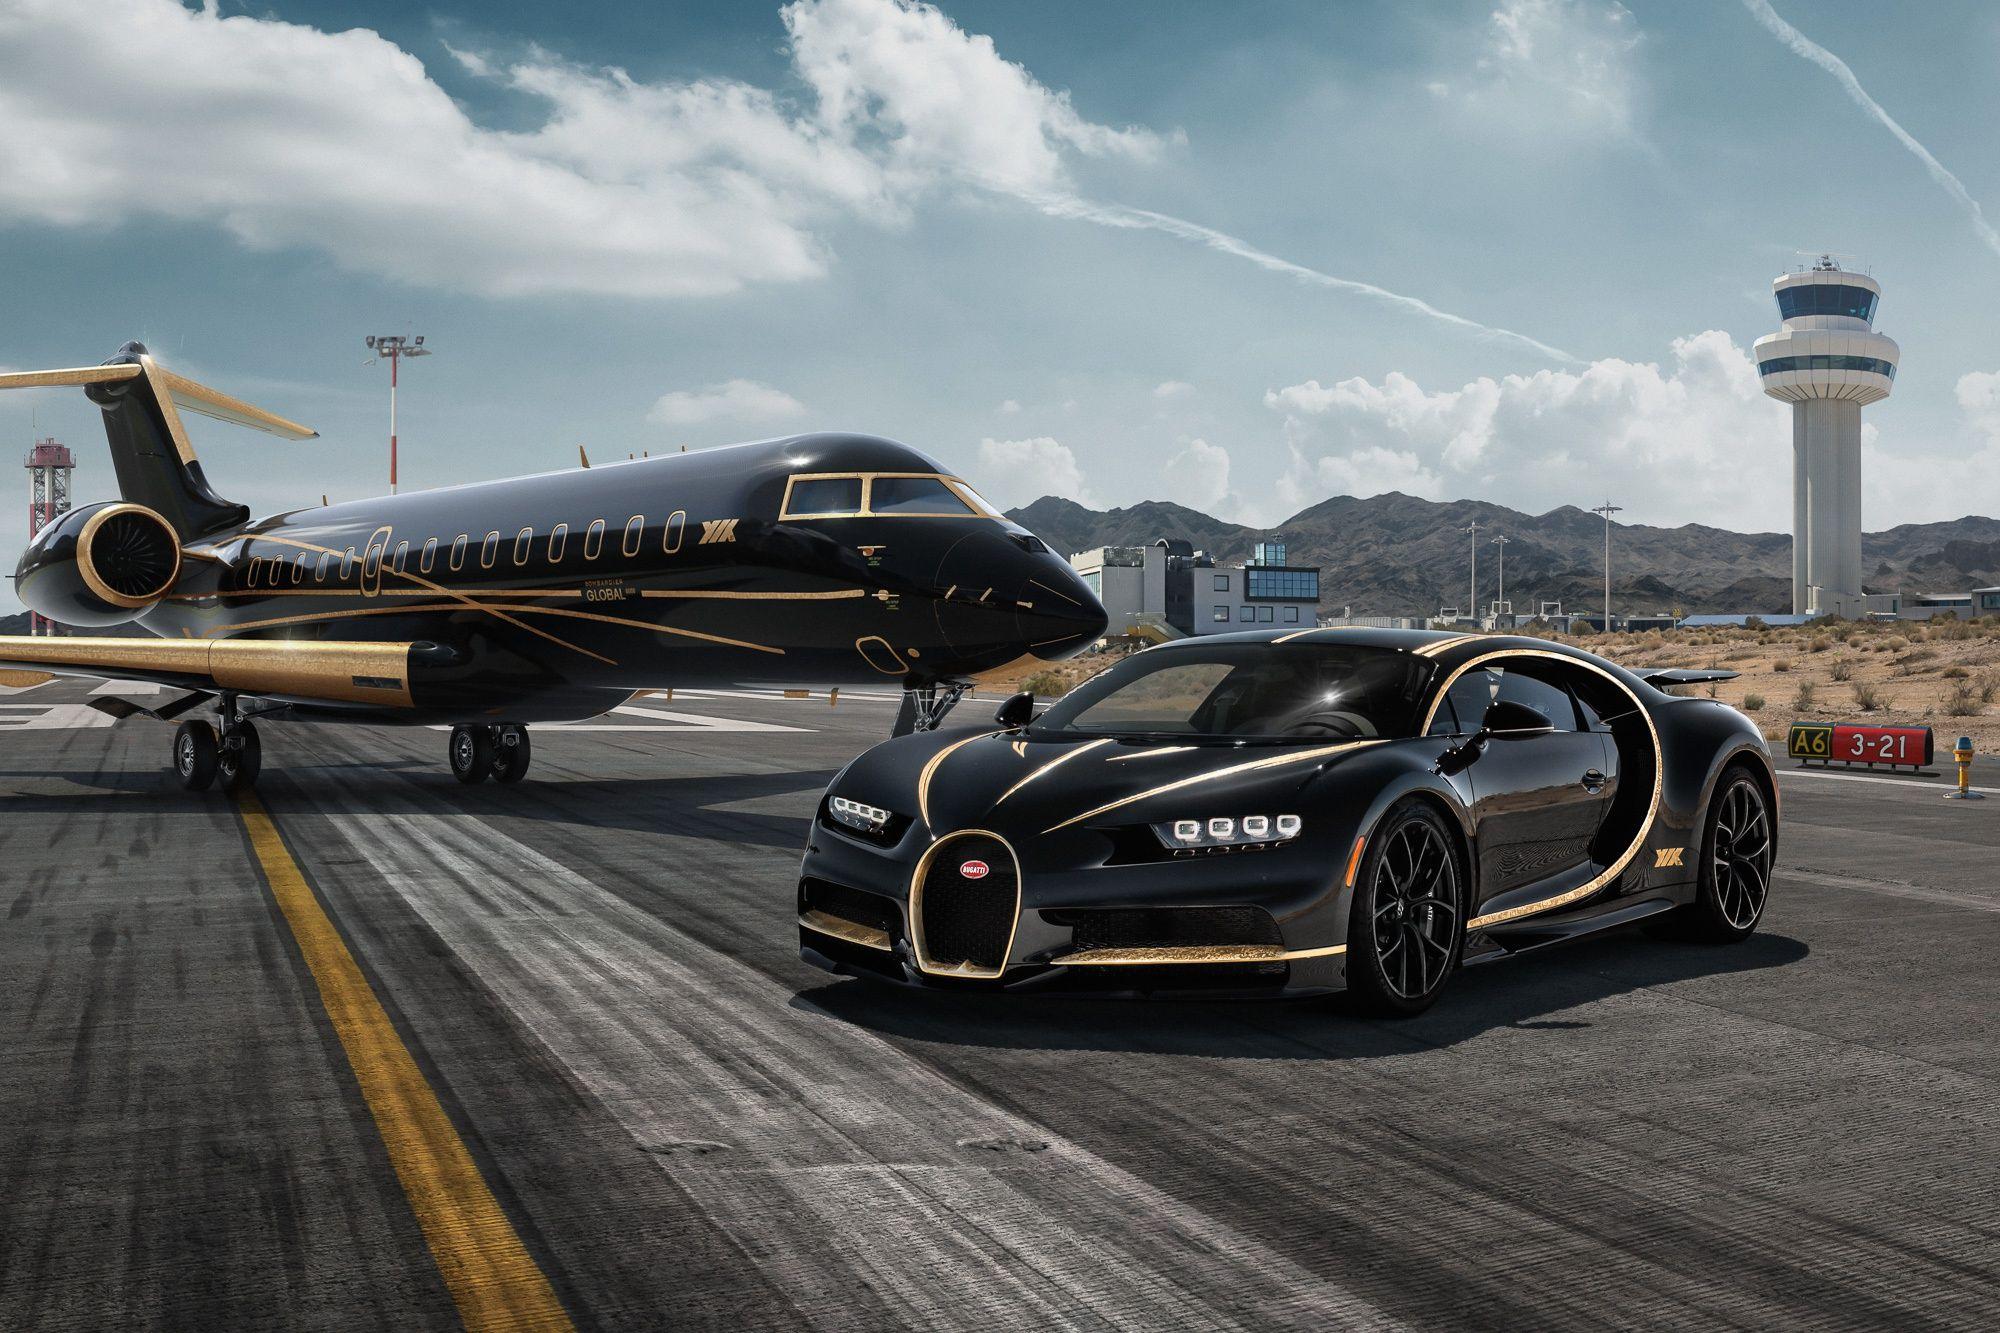 Bugatti Chiron Bugatti chiron black, Bugatti chiron